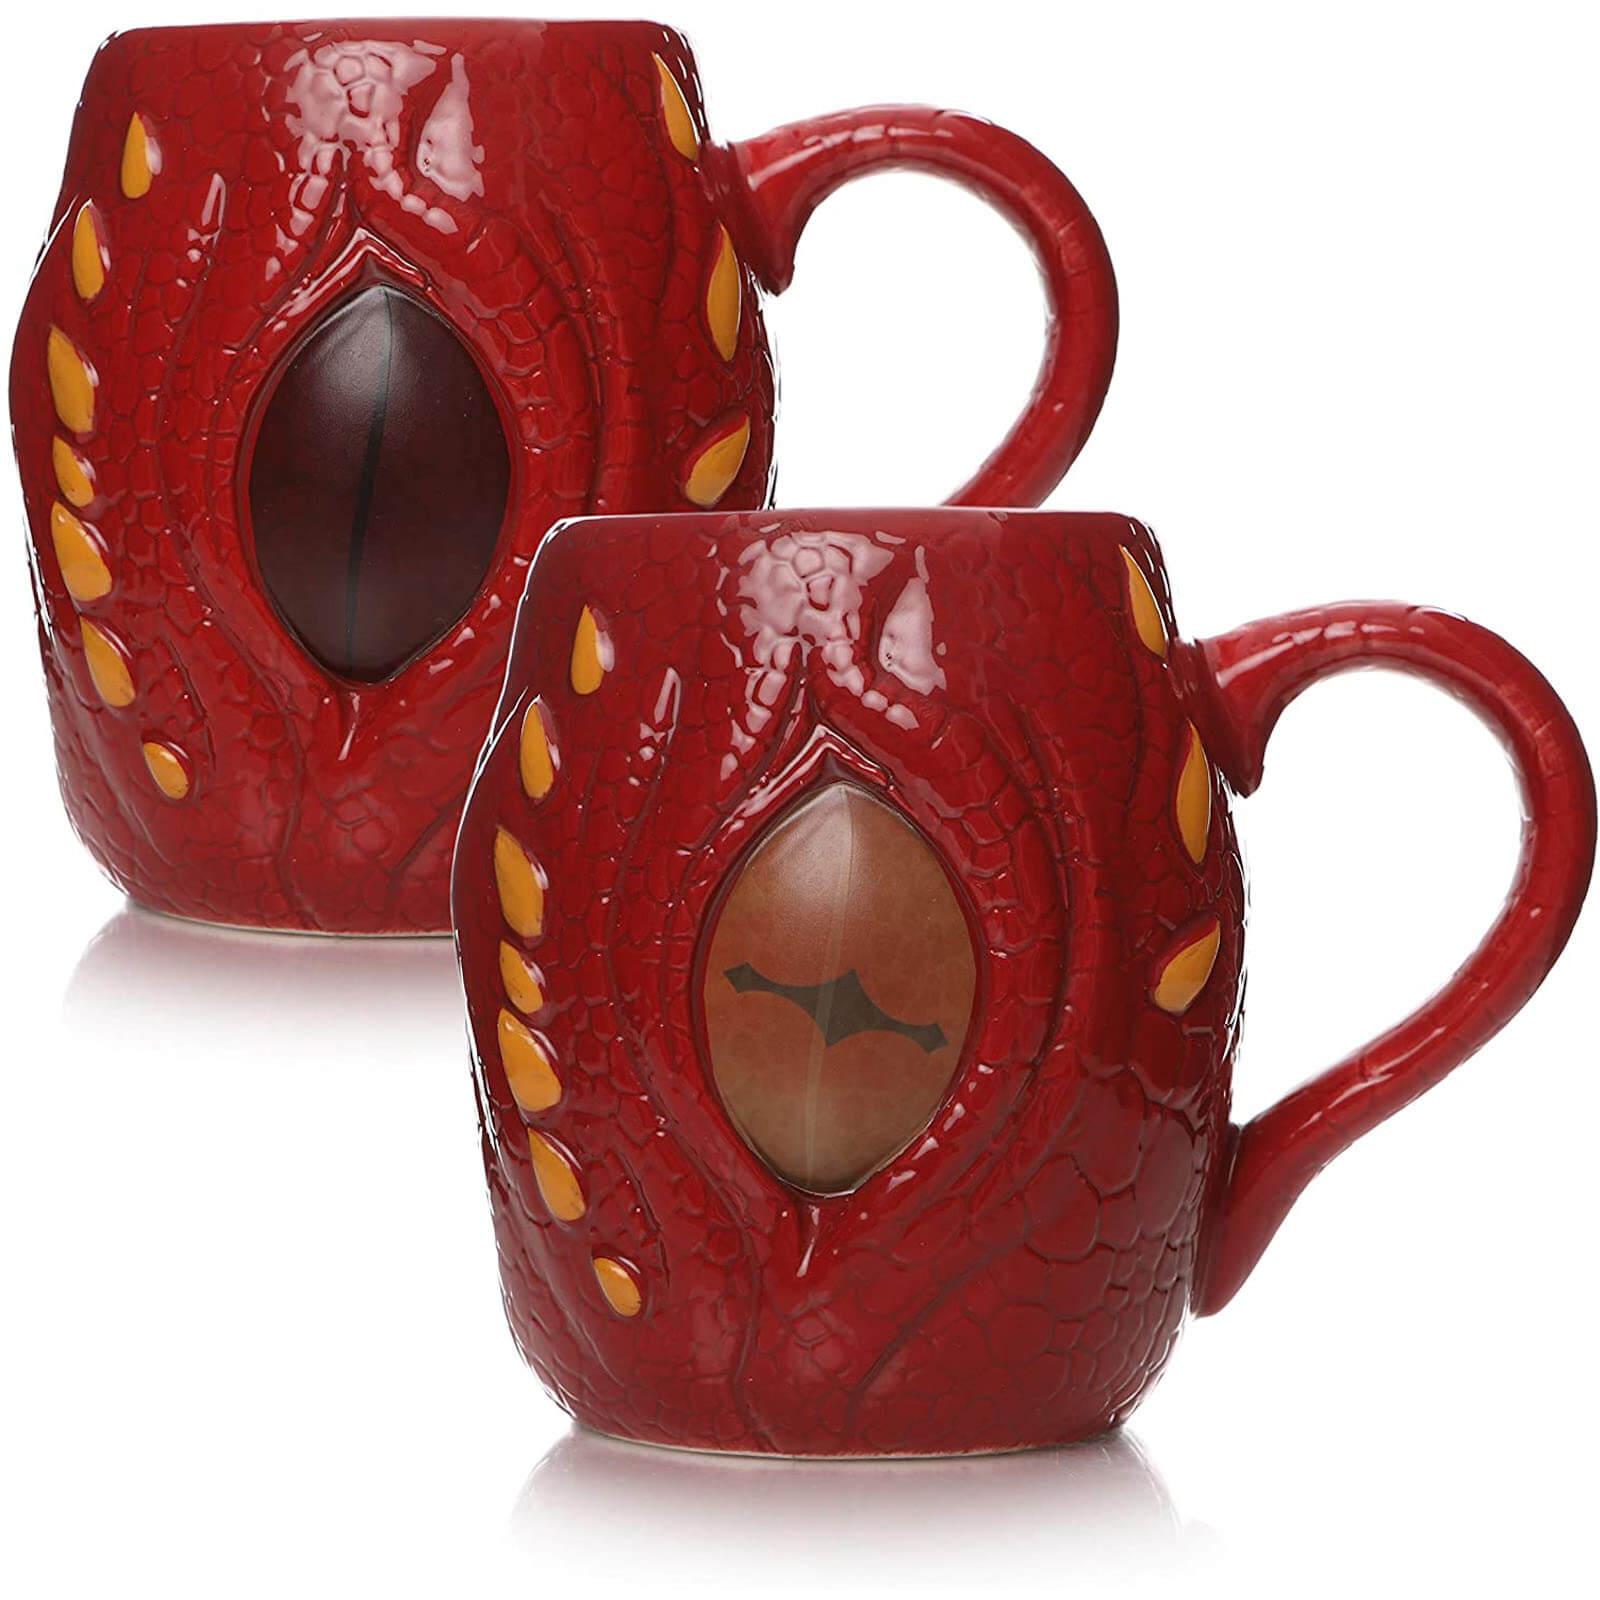 Image of The Hobbit Smaug Shaped Mug